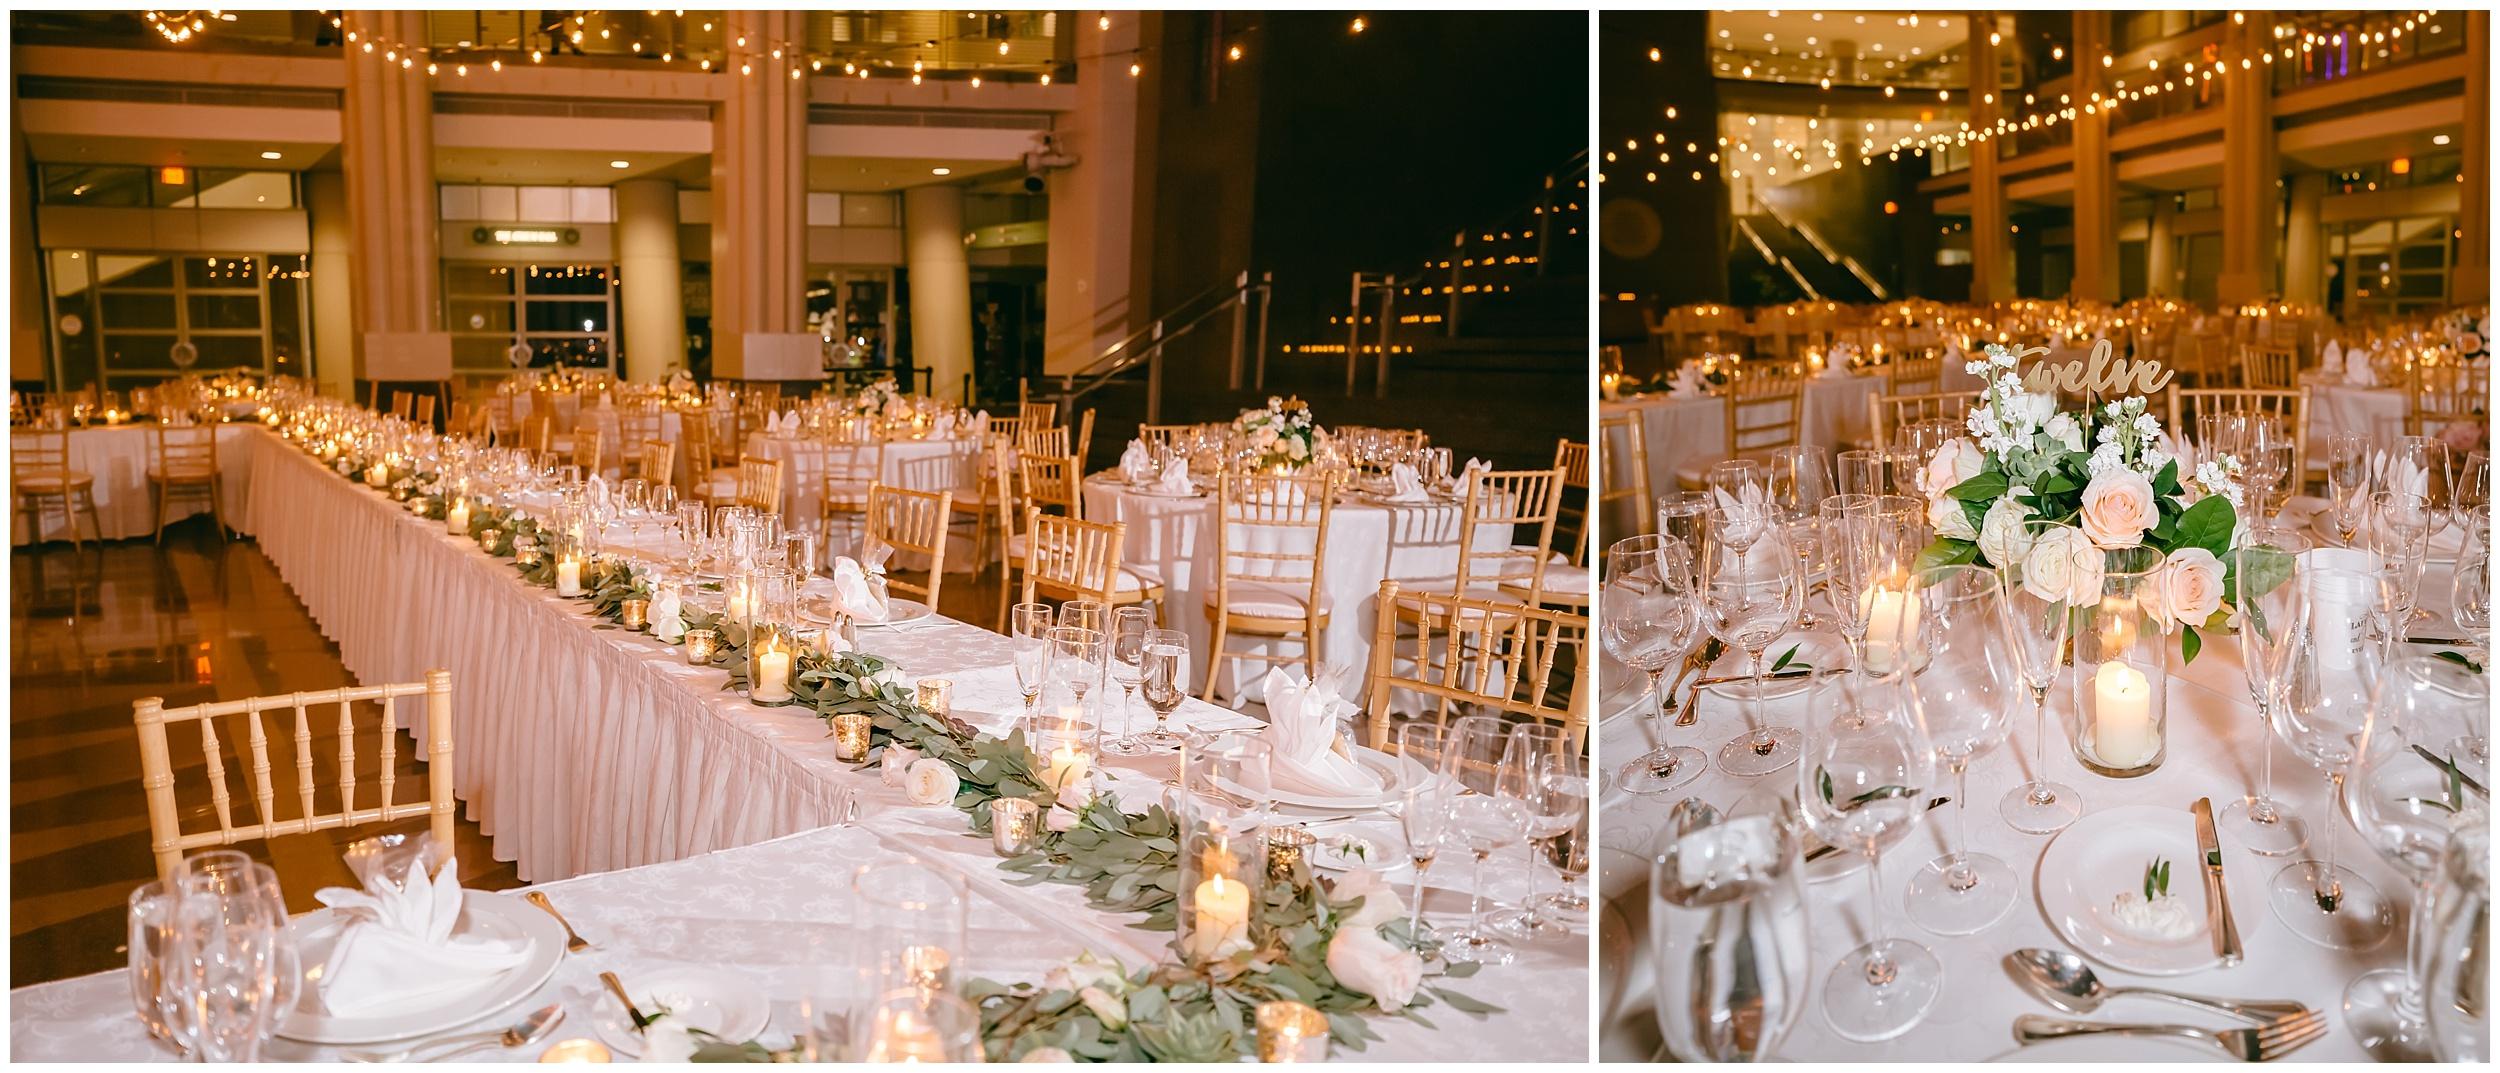 wedding-reception-details-atrium-ronald-reagan-washington-dc-photographer